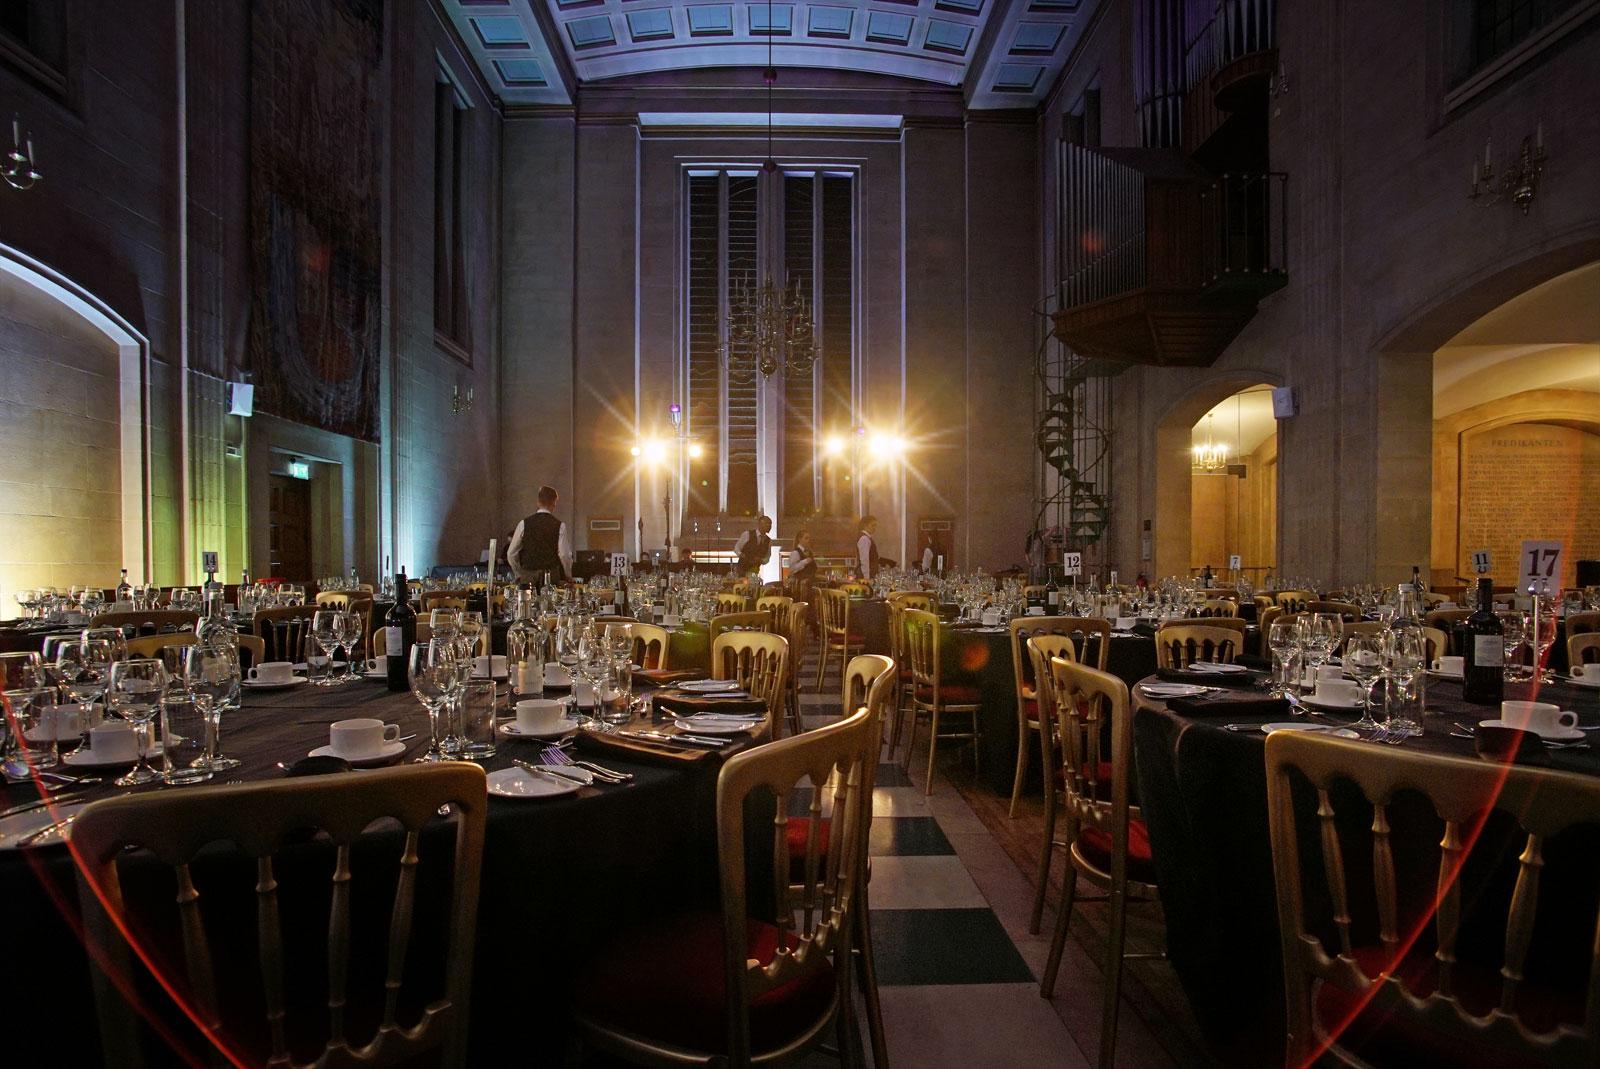 City of London event venue The Dutch Hall preparing a silver service dinner event